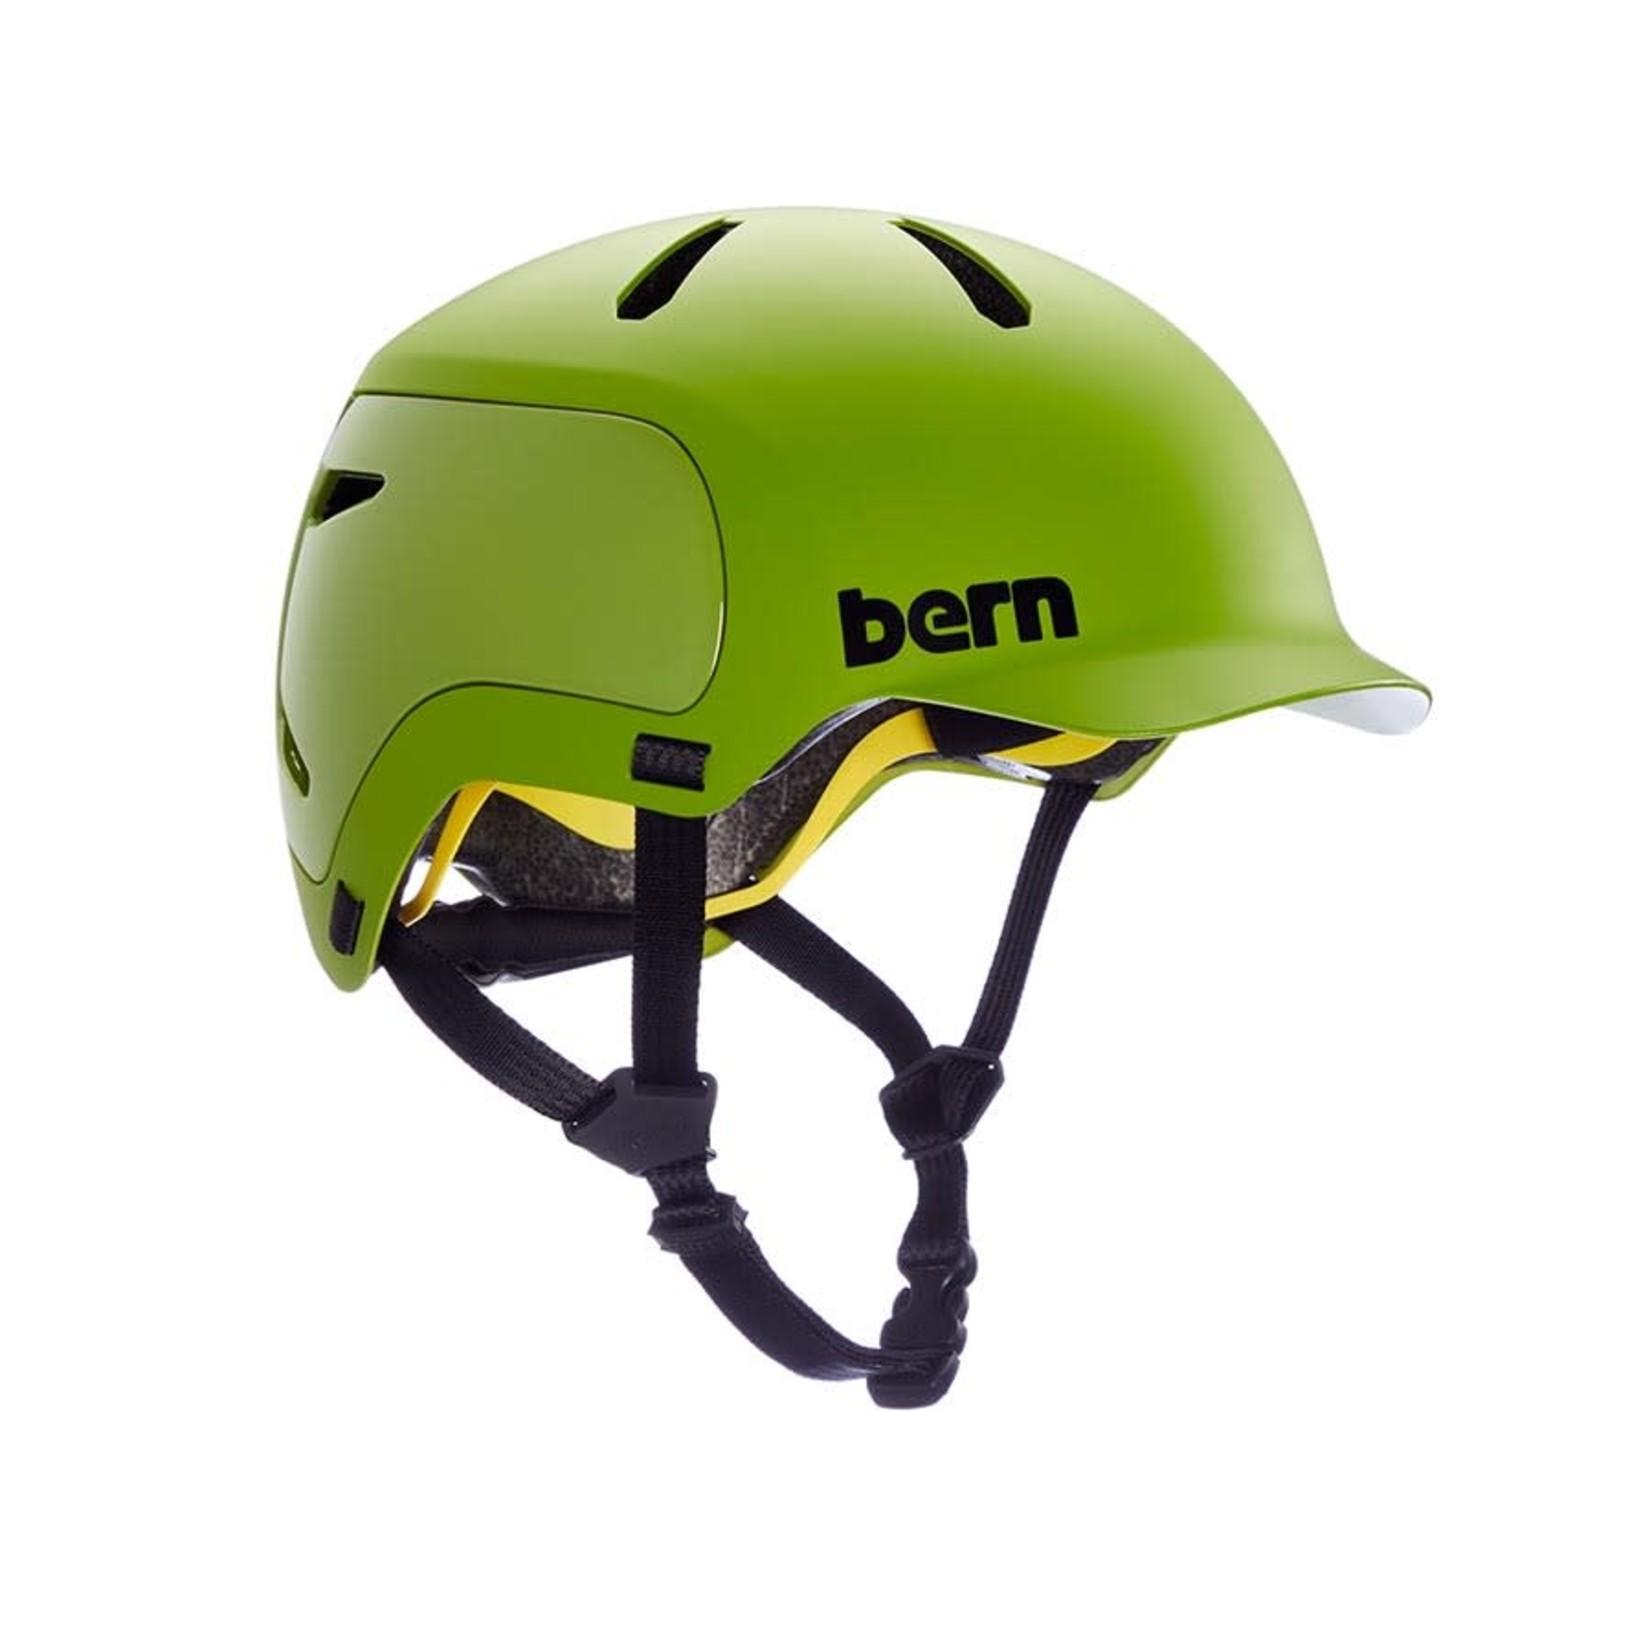 Bern Bern, Watts 2.0 MIPS, Helmet